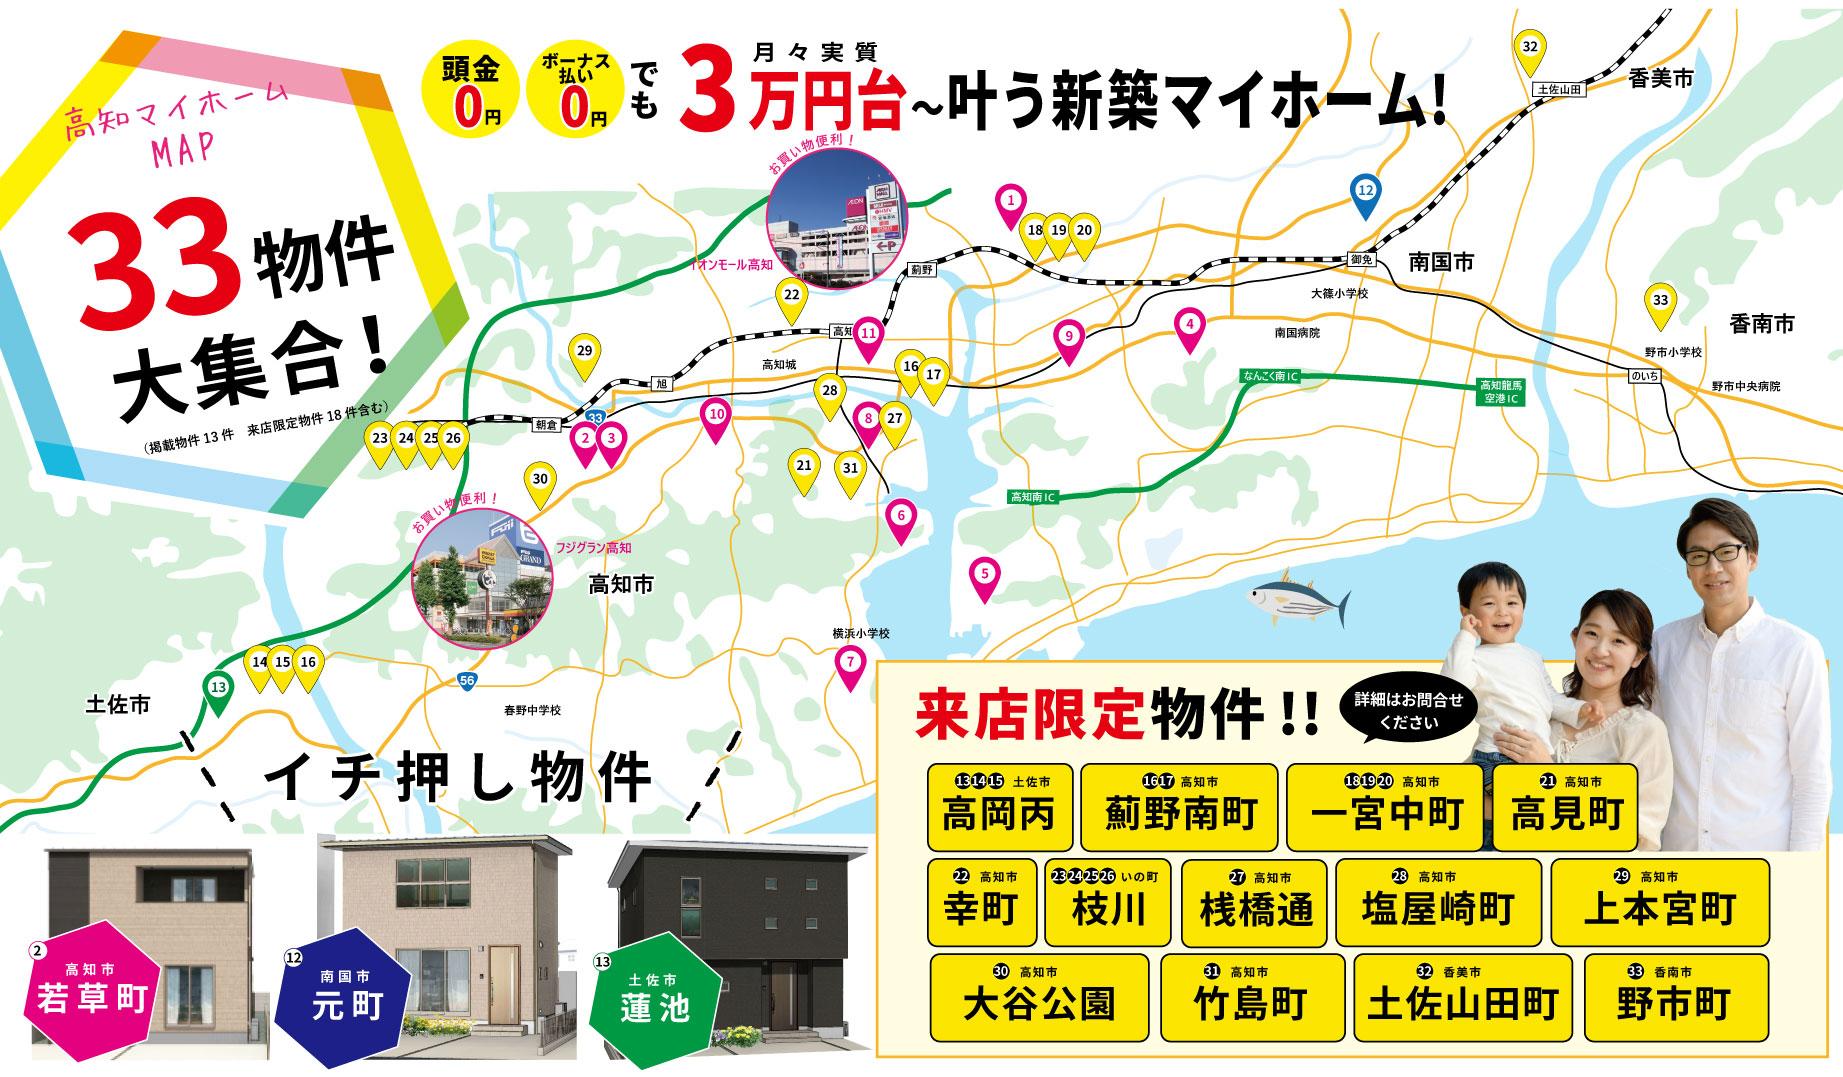 【新着】高知県内分譲住宅マップ!